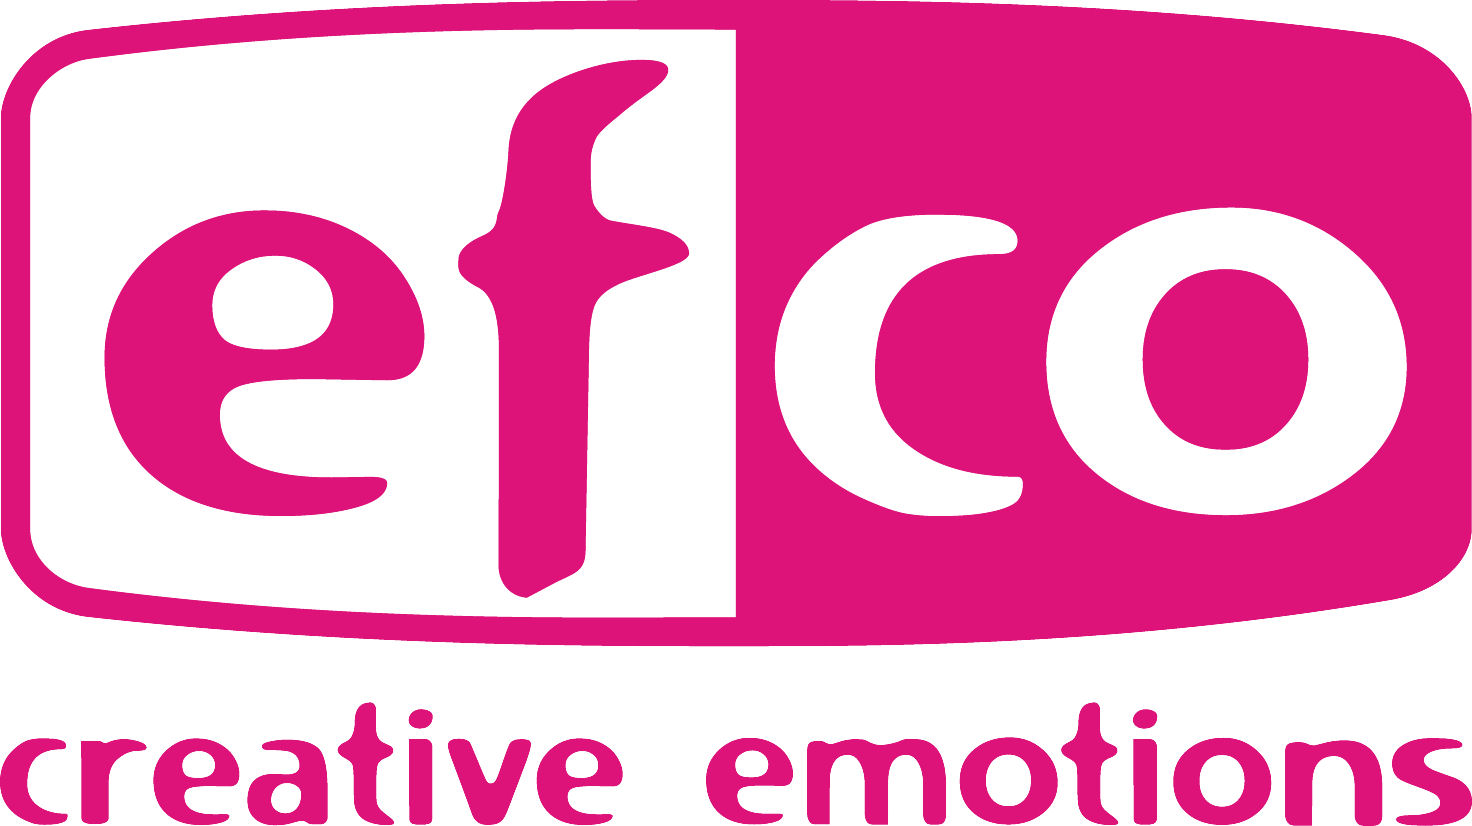 EFCO creativ emotions Magenta klein